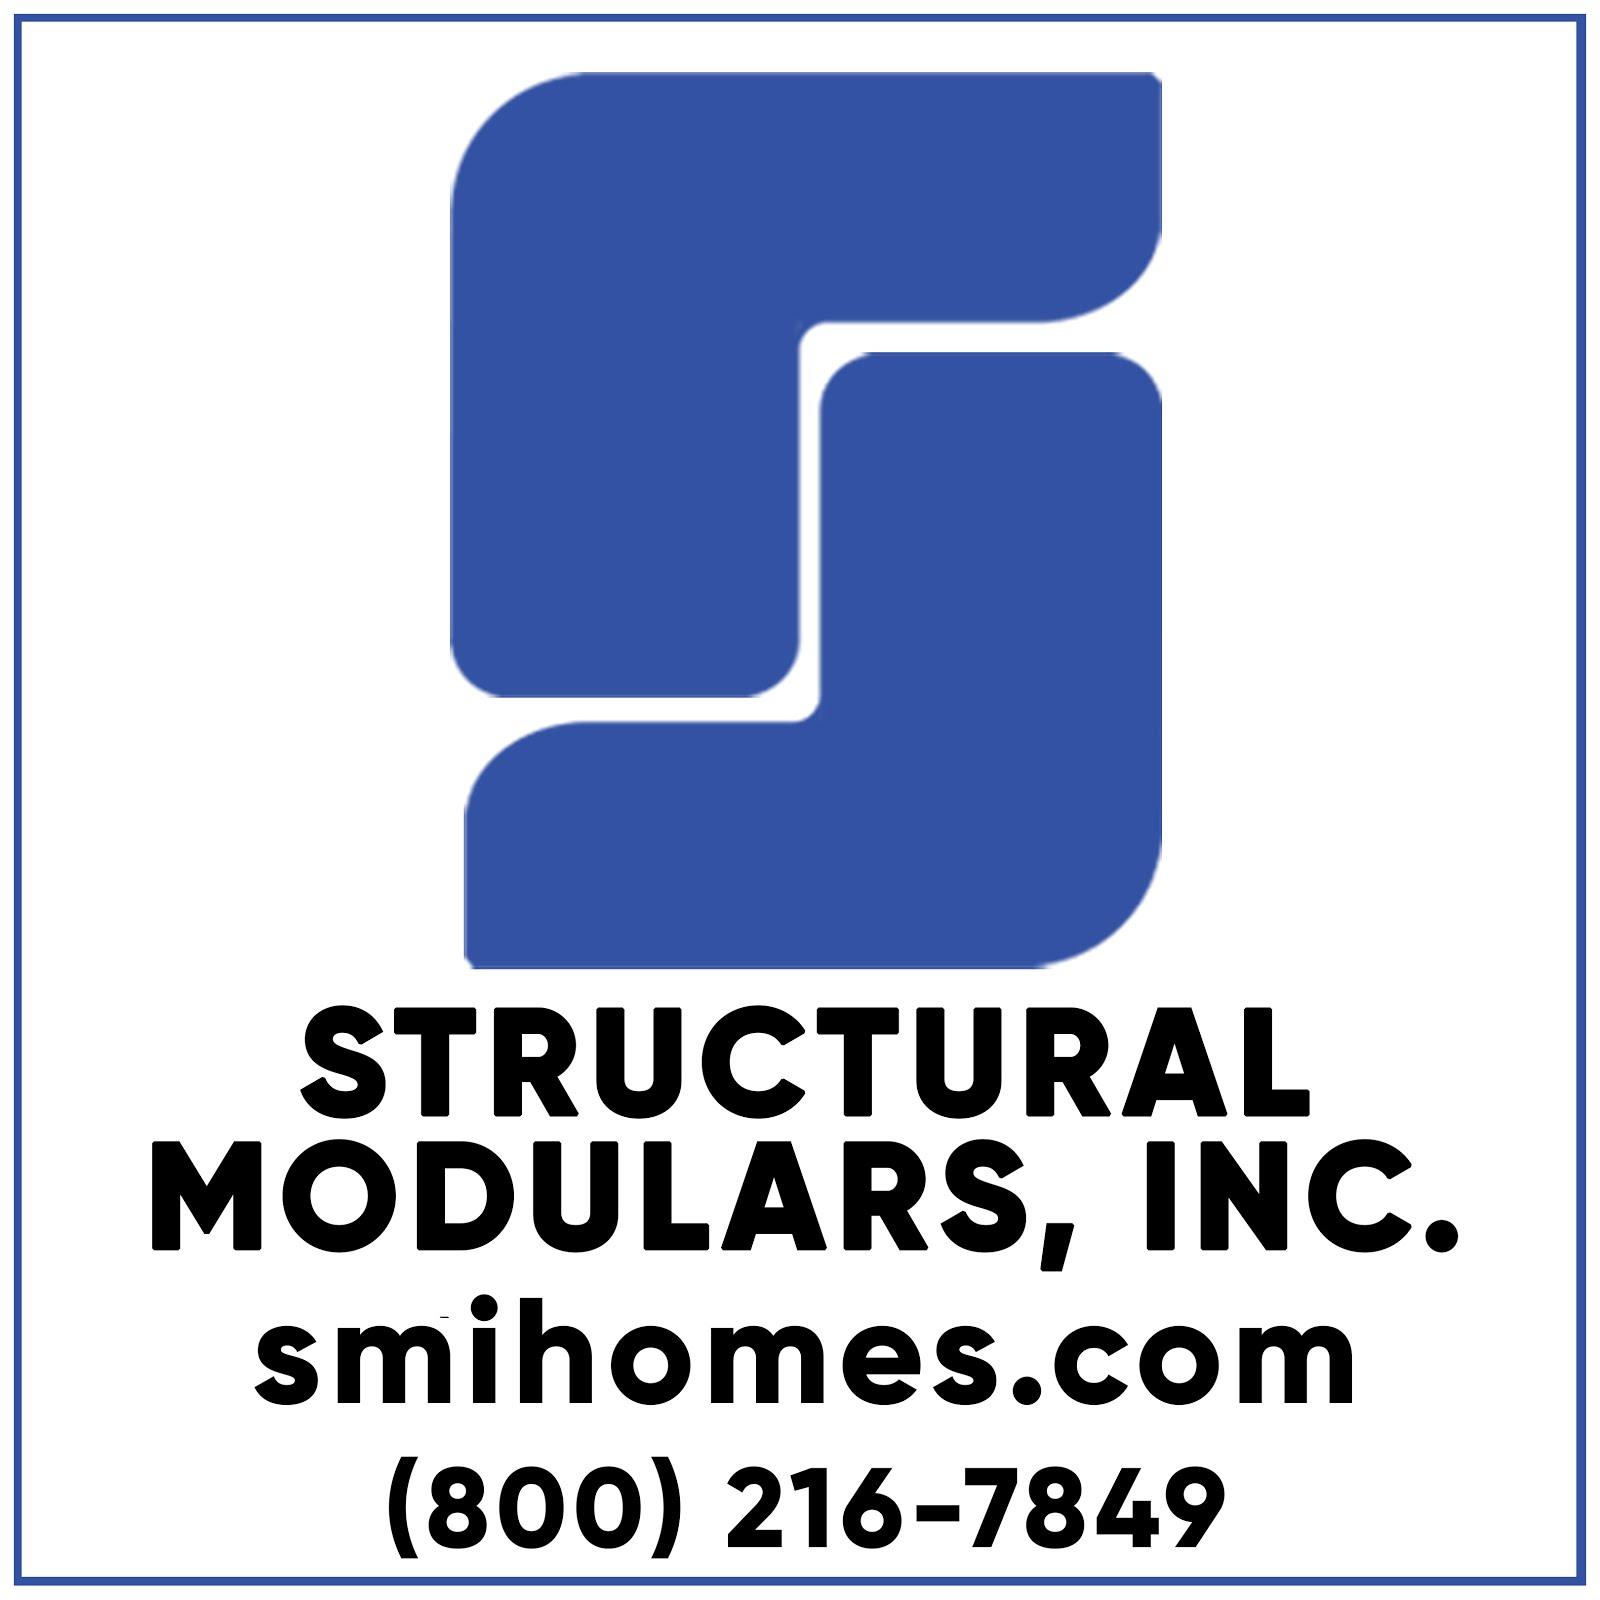 Structural Modulars